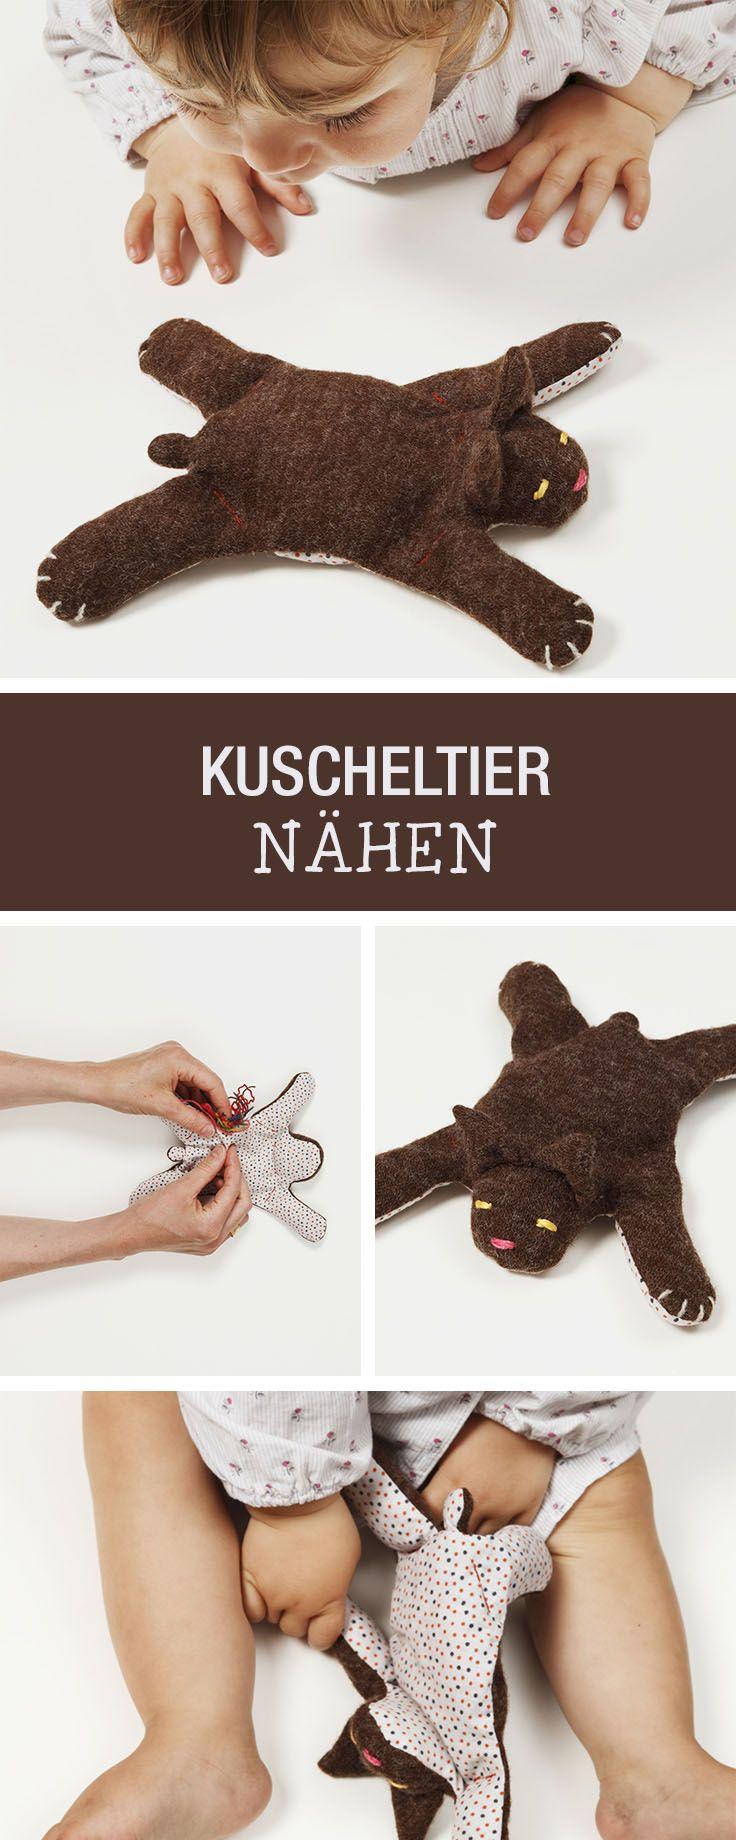 DIY-Anleitung: Kuscheltier für Deinen kleinen Schatz nähen, Teddybär / DIY tutorial: sewing soft toy for your little one, teddy bear via DaWanda.com